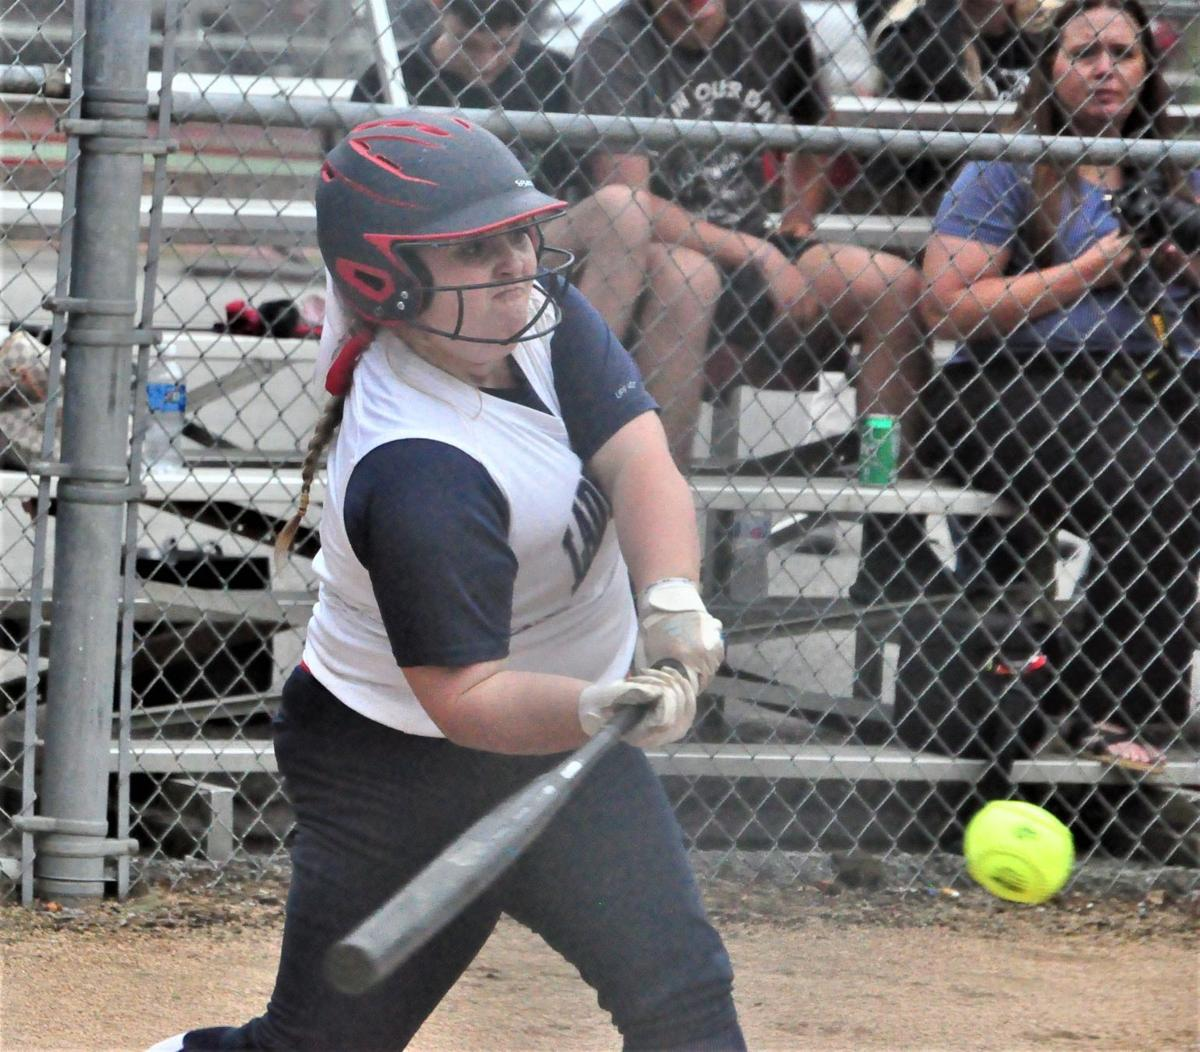 Man Tug Valley Ashlee Tomblin bat on ball